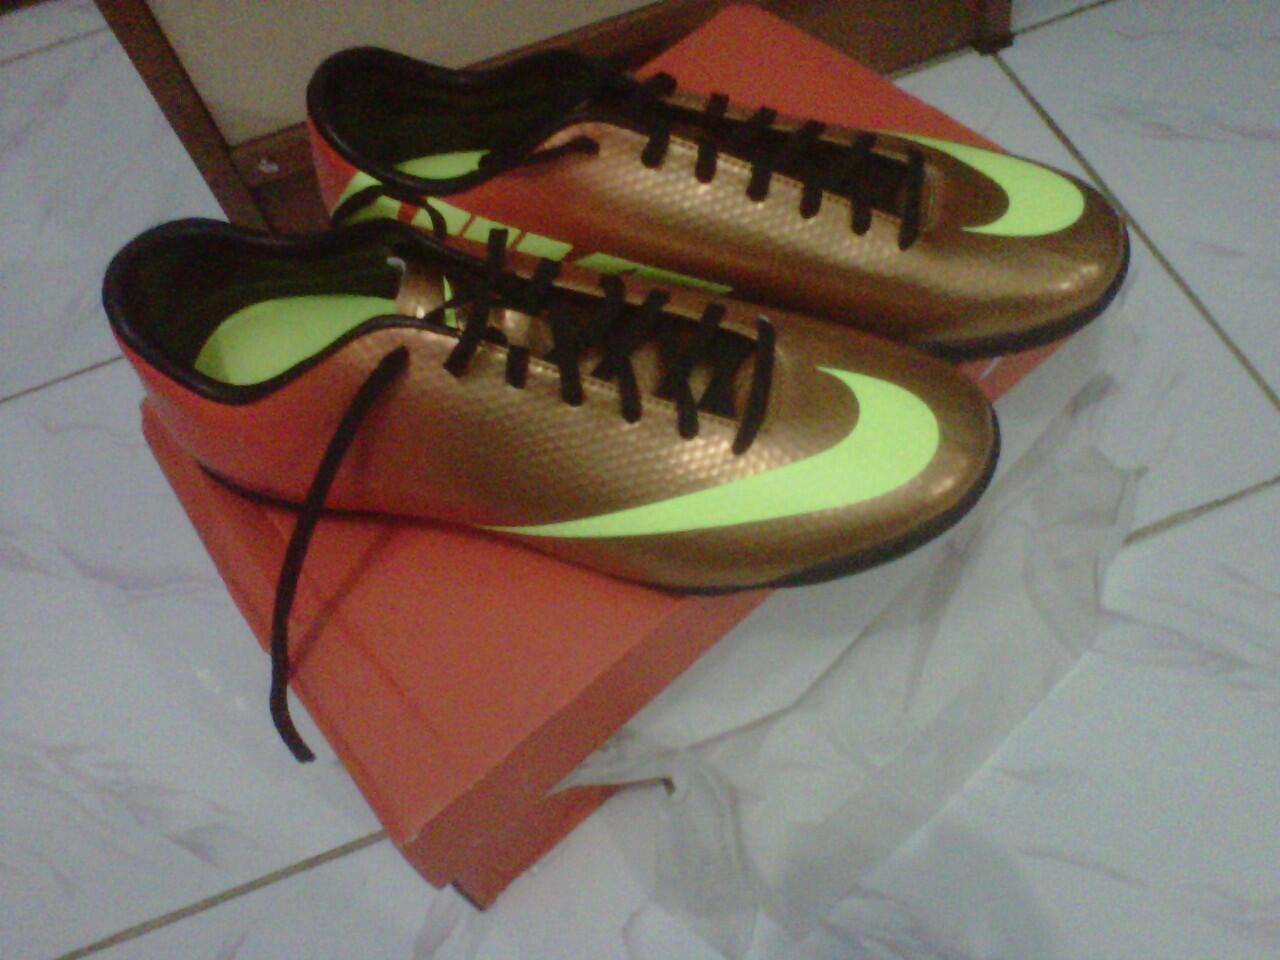 JUAL Sepatu Futsal Nike Mercurial Victory IV Sunset